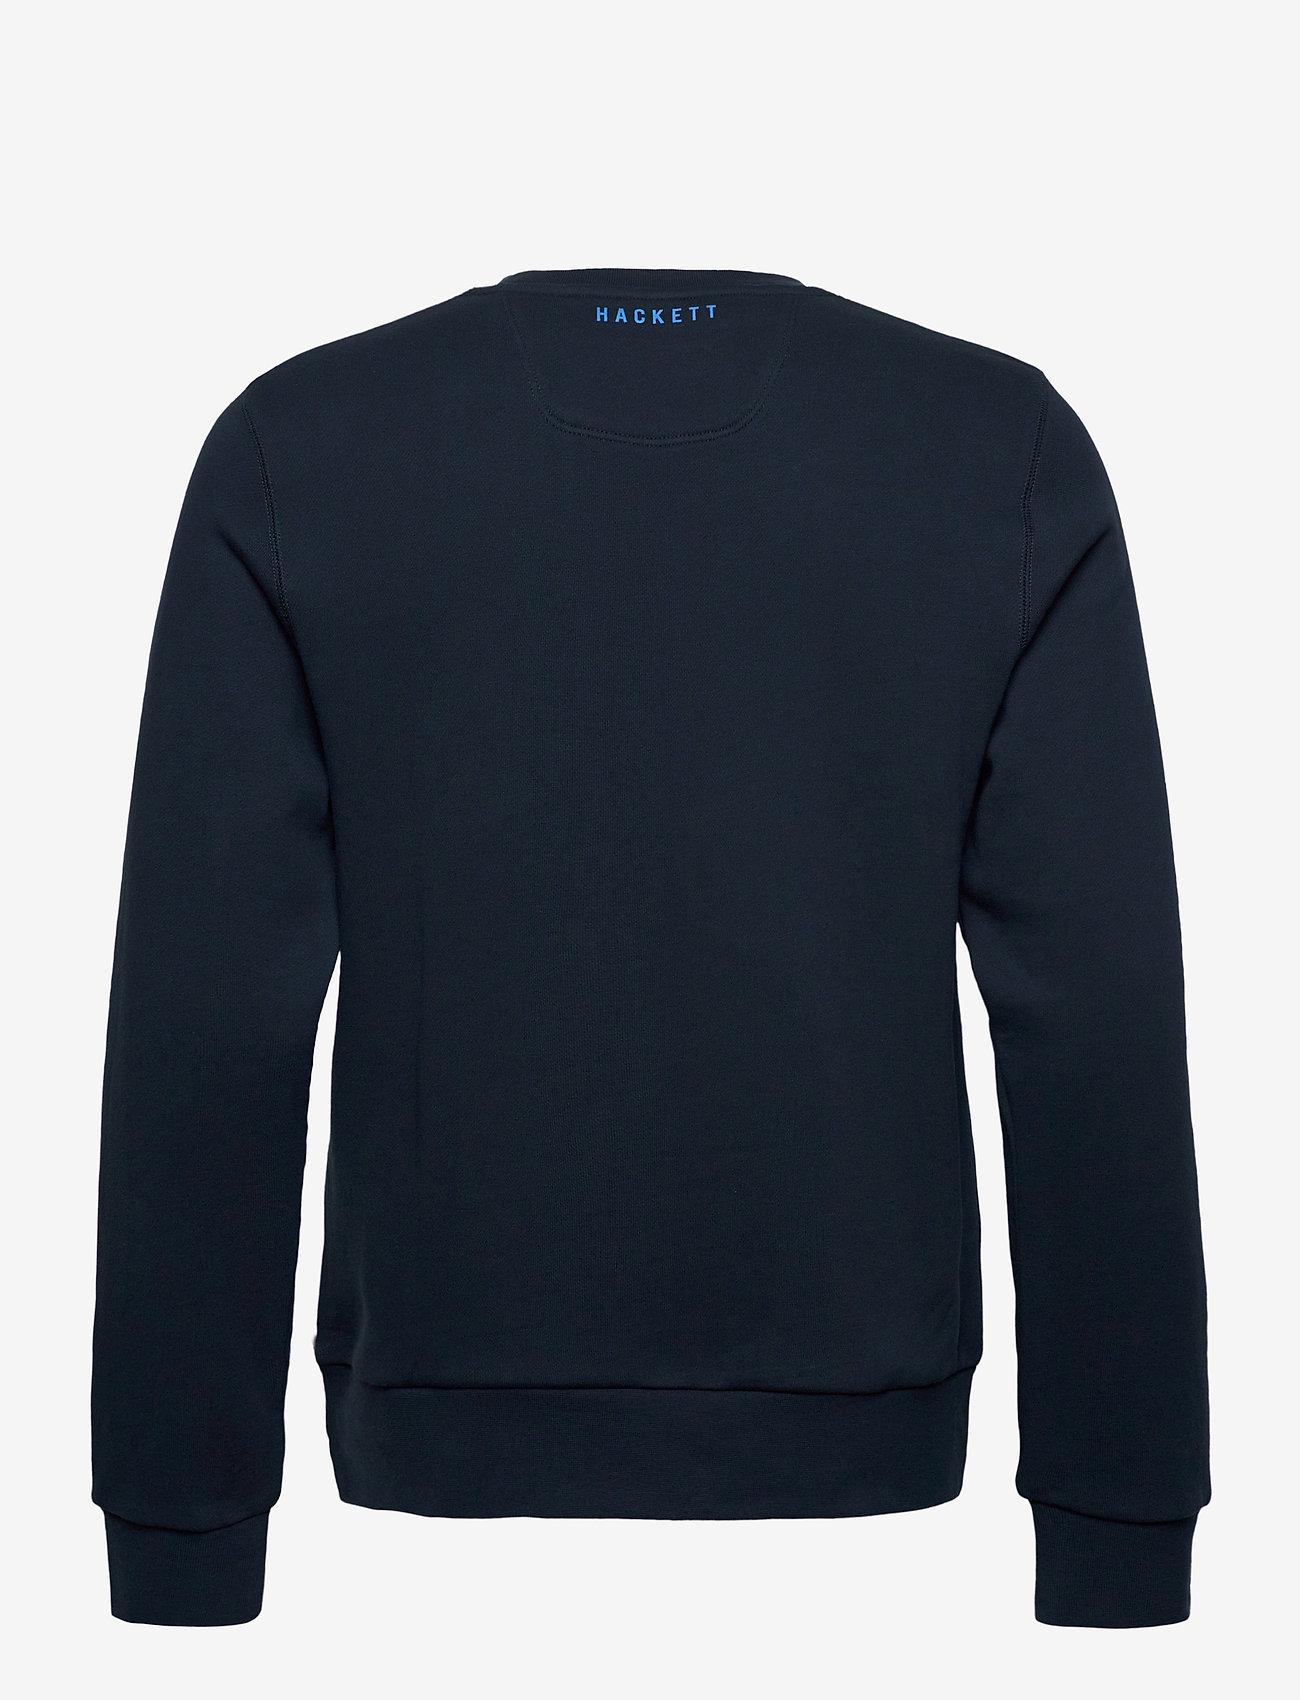 Hackett London AMR LOGO CREW - Sweatshirts NAVY - Menn Klær